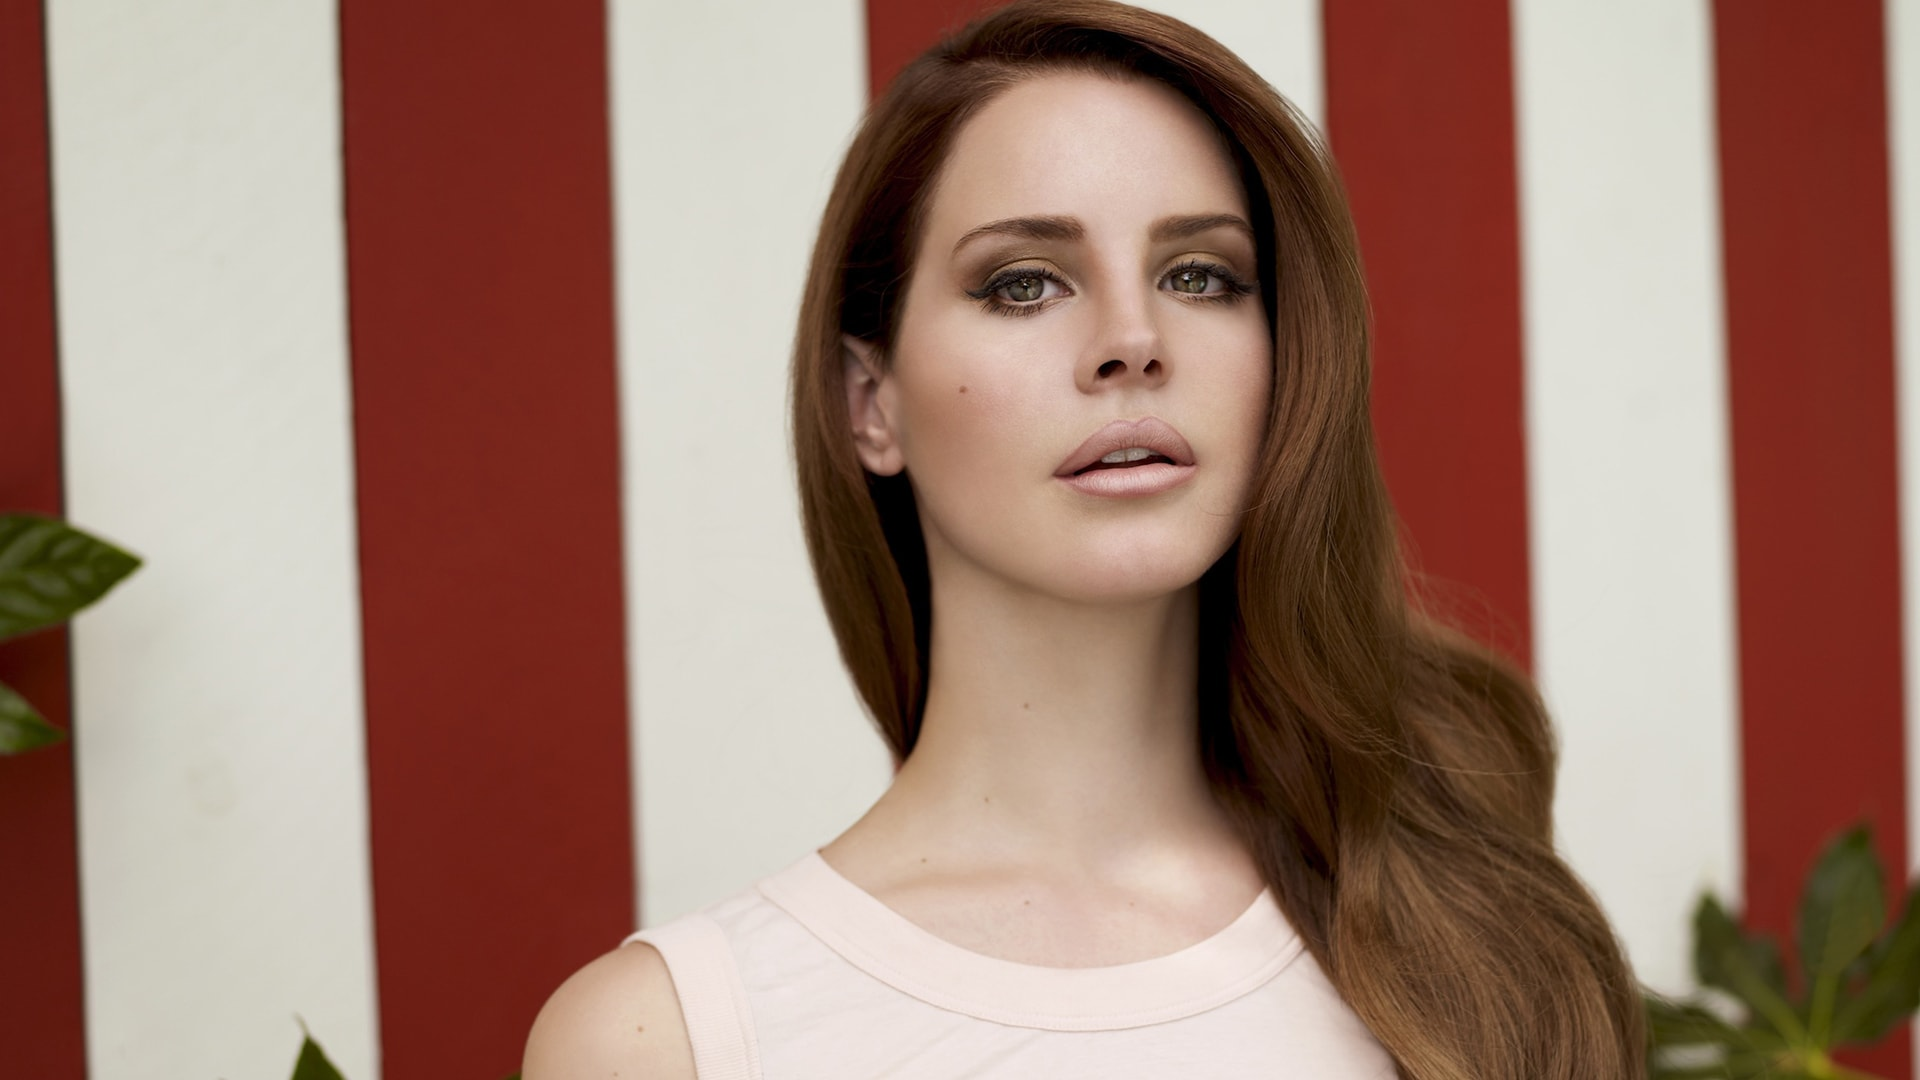 Lana Del Rey Free